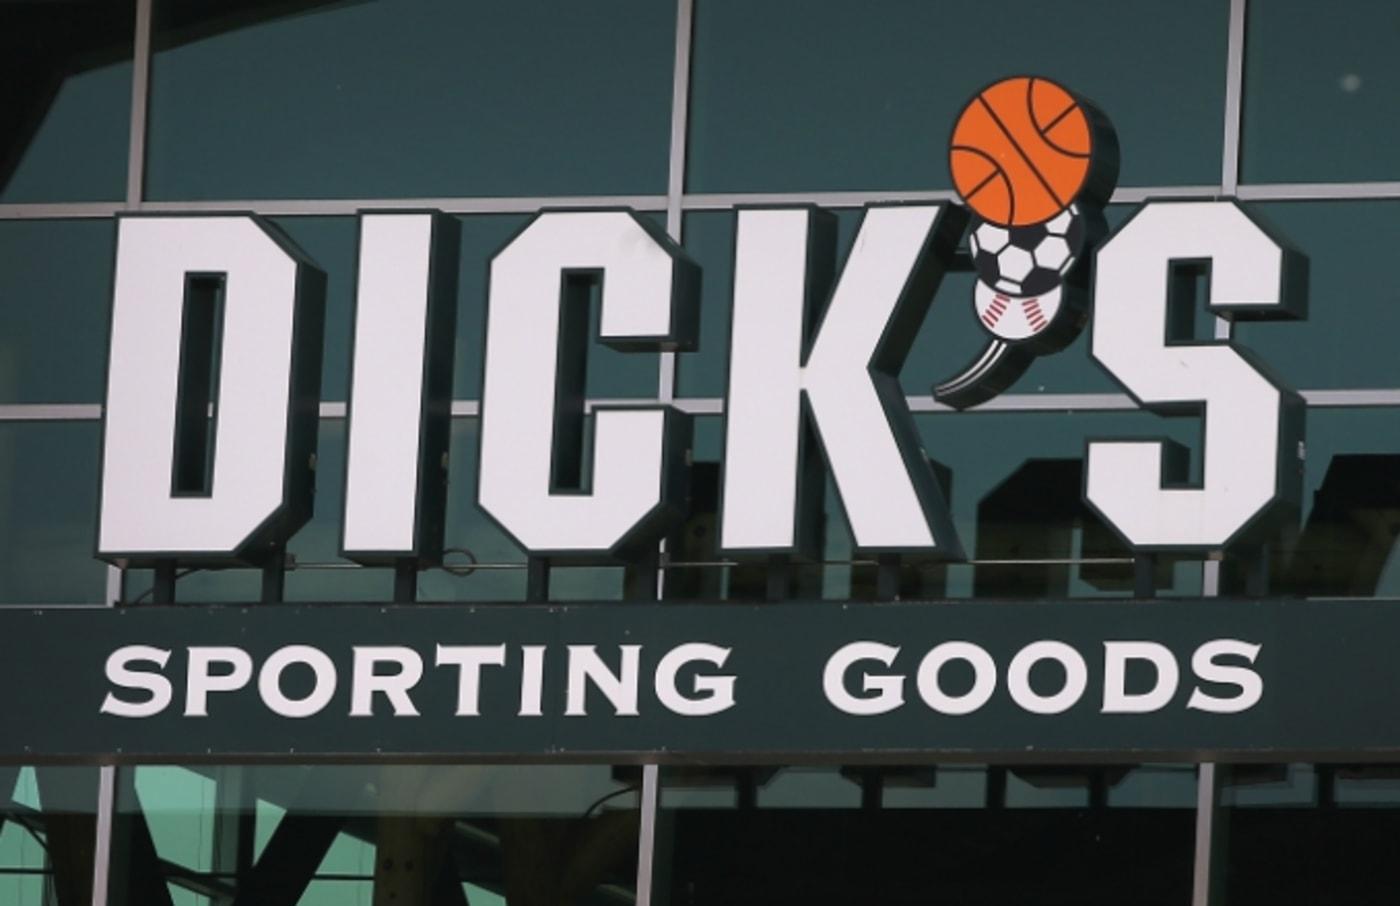 Dick's Sporting Goods.